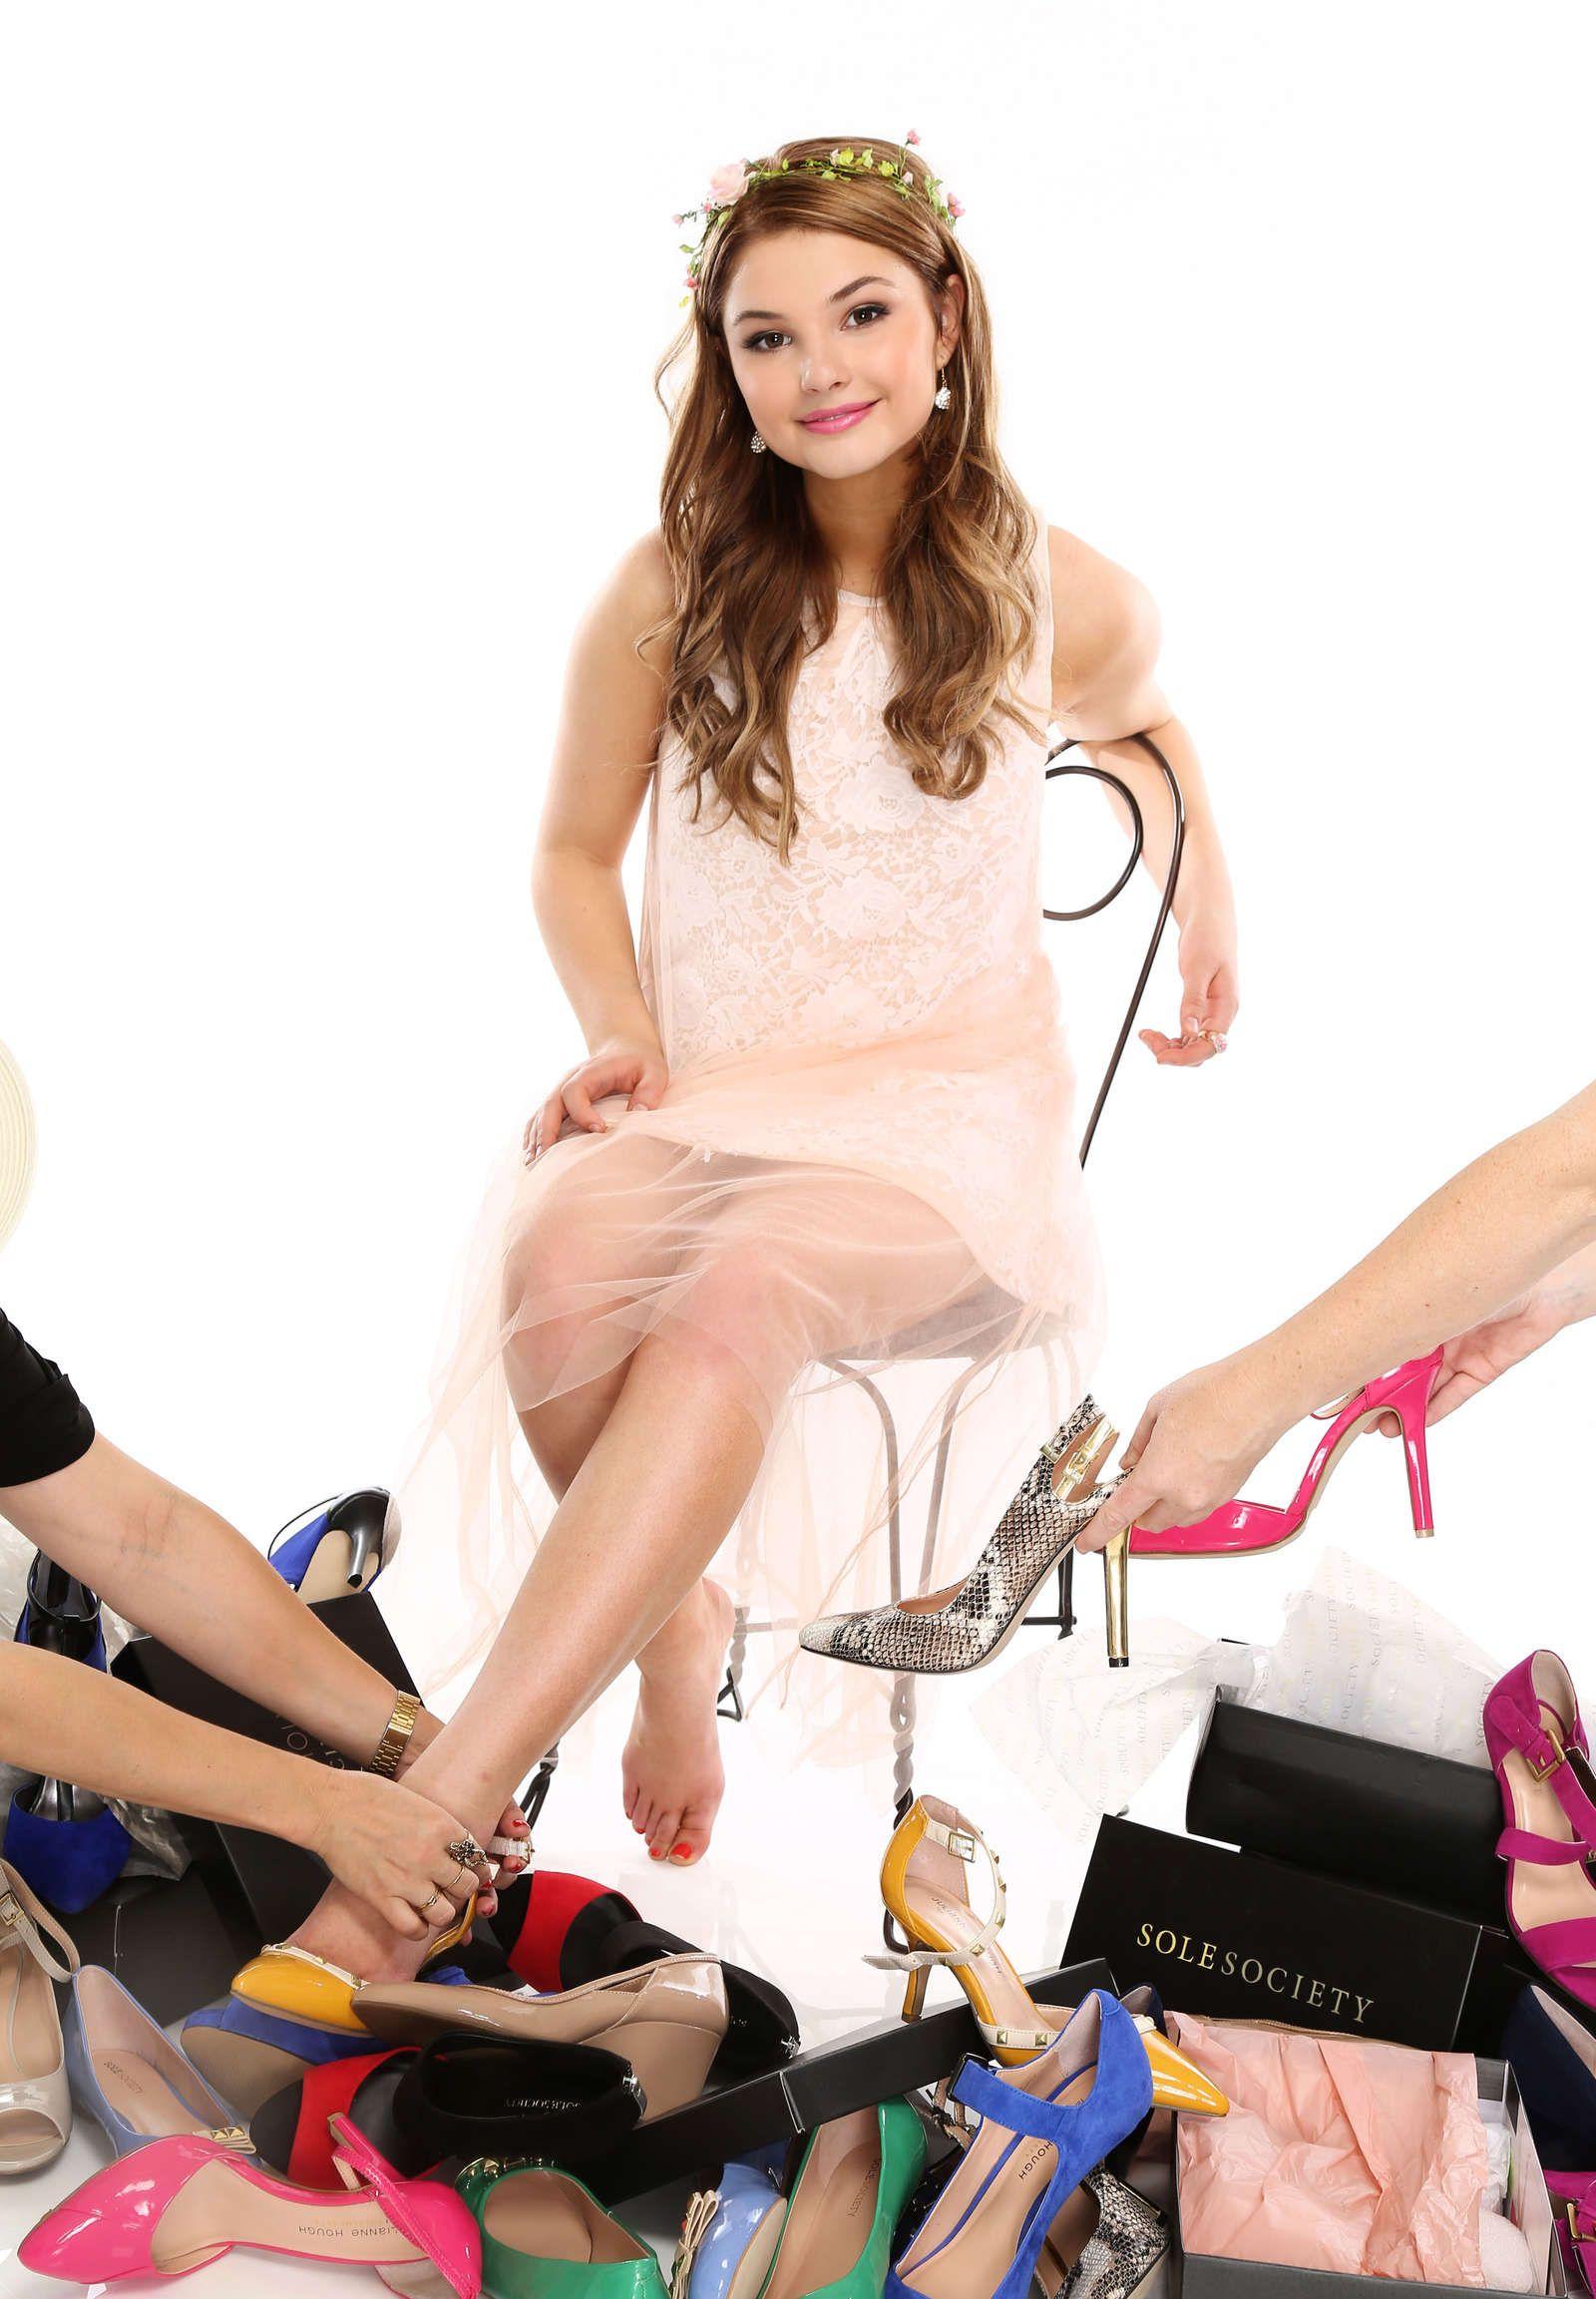 Stefanie Scott | Stefanie scott, Scott, Beautiful celebrities